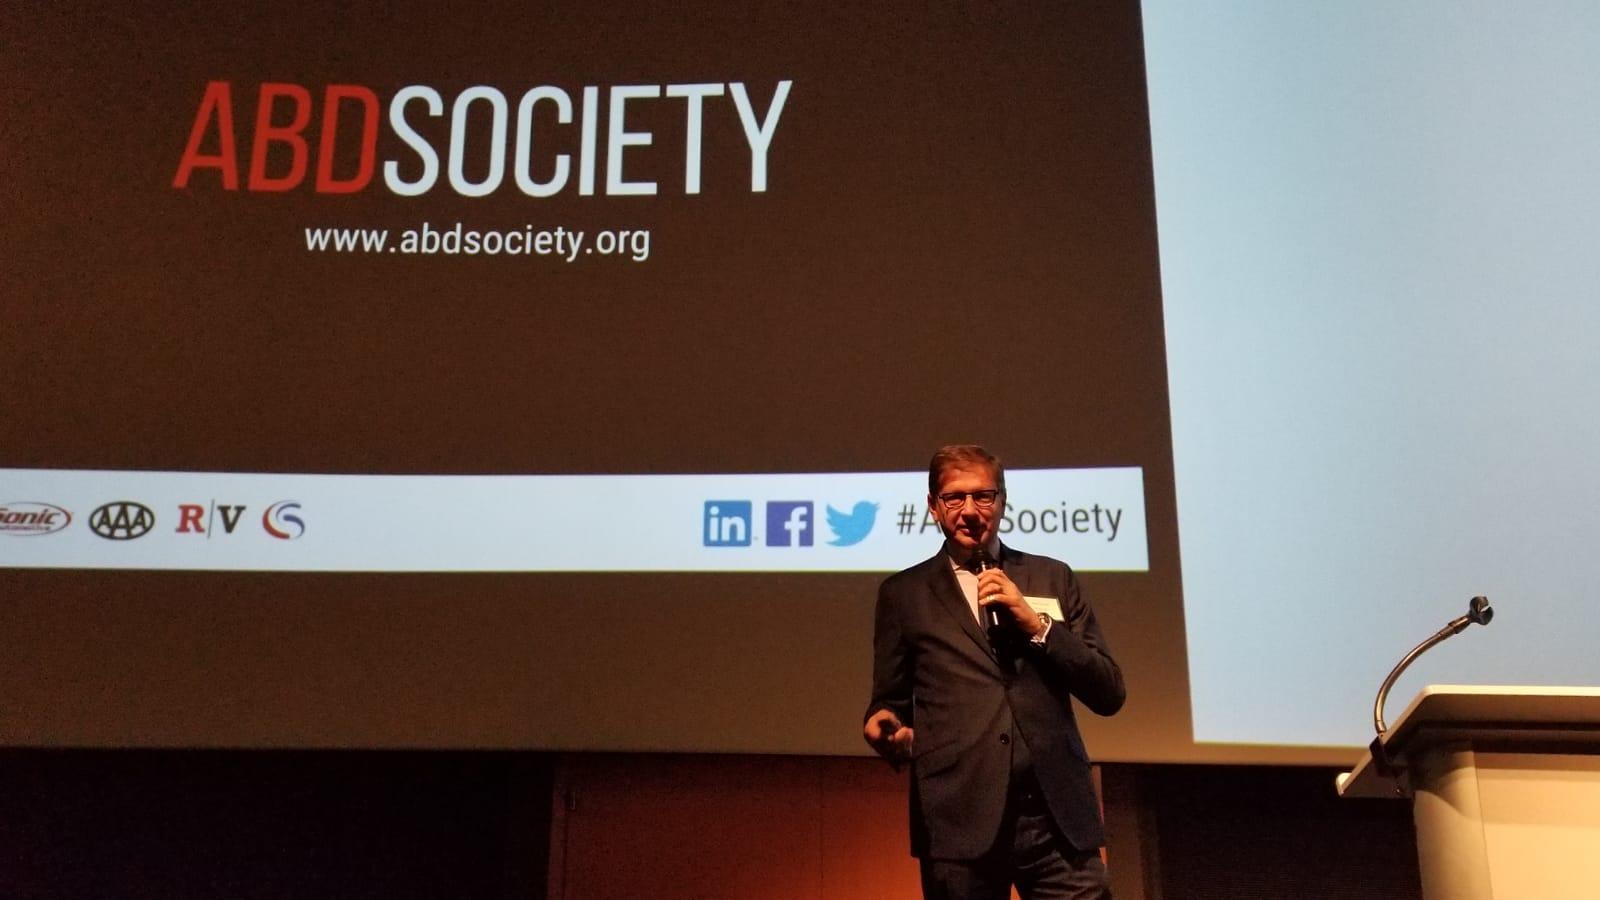 Mirsad Hadzikadic - Executive Director at UNCC Data Science Initiative